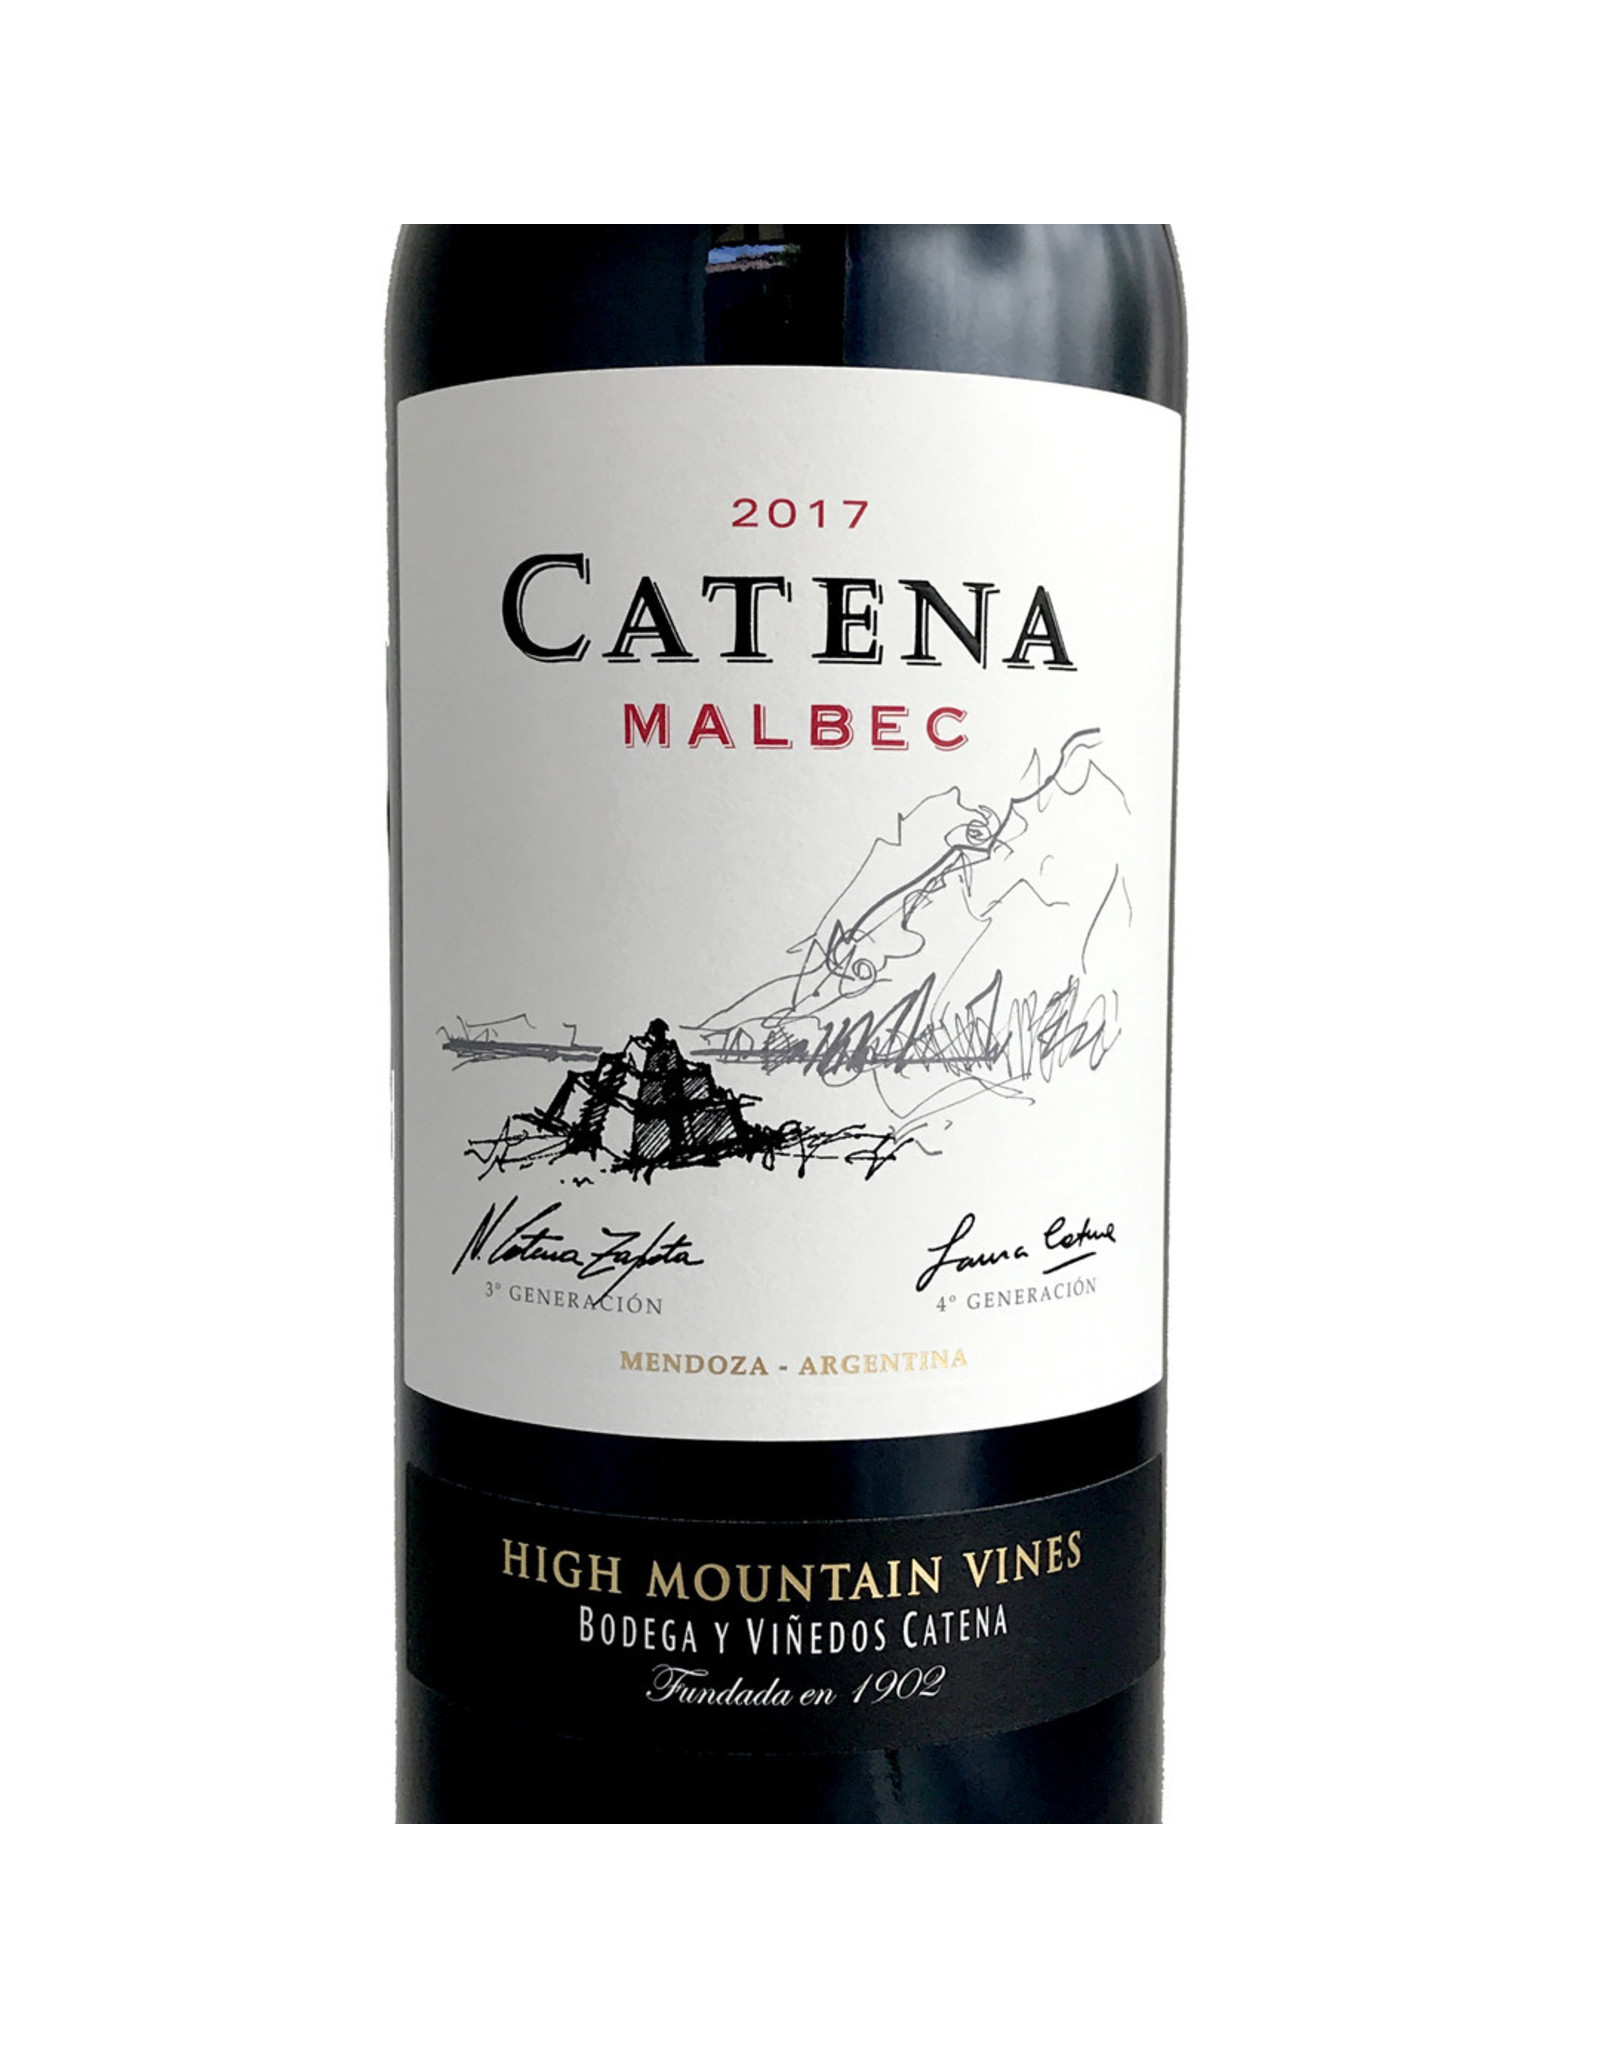 Catena Malbec High Mountain Vines 2017